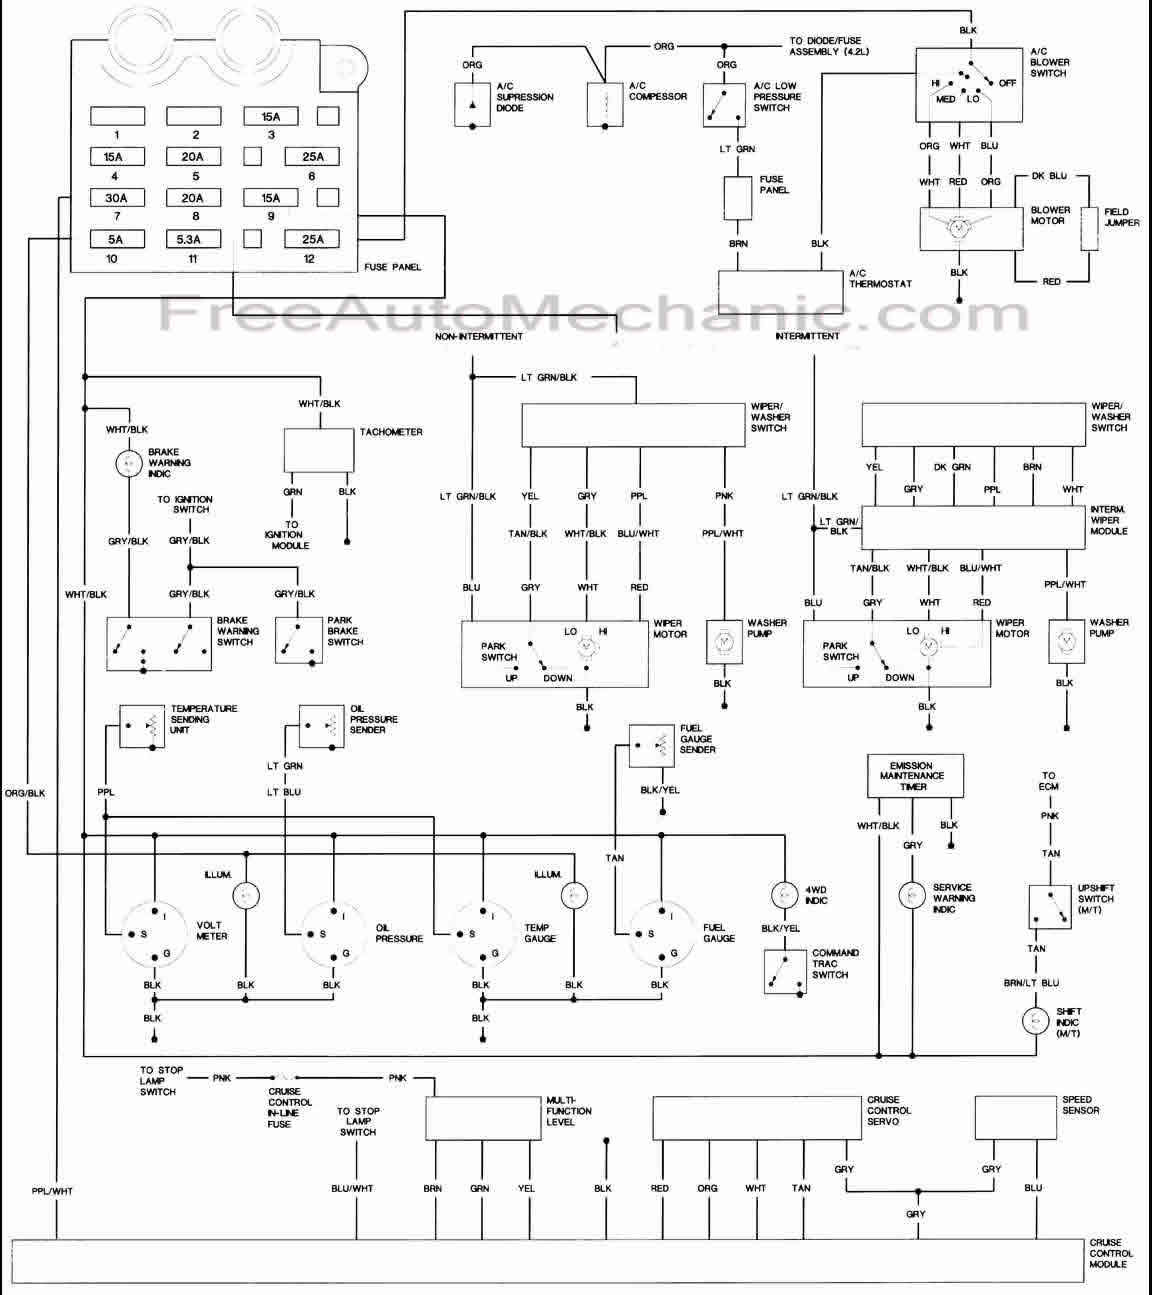 1987 jeep yj wiring diagram schematic image 2